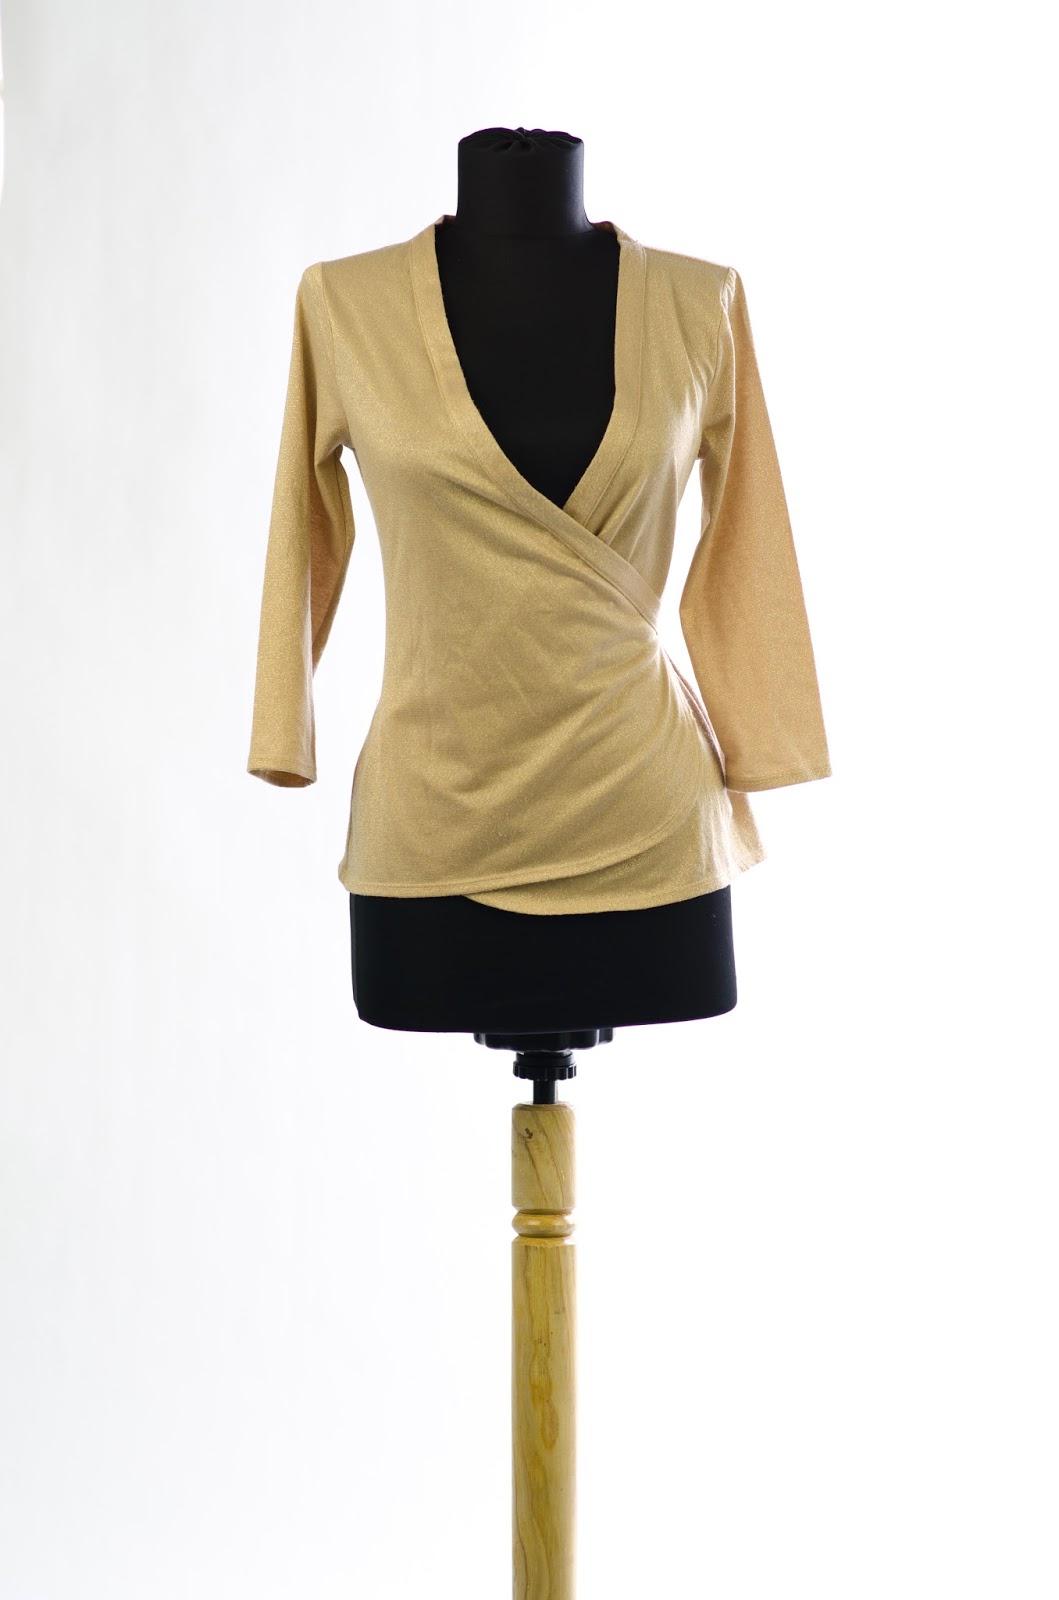 St bernard clothing dunnes stores